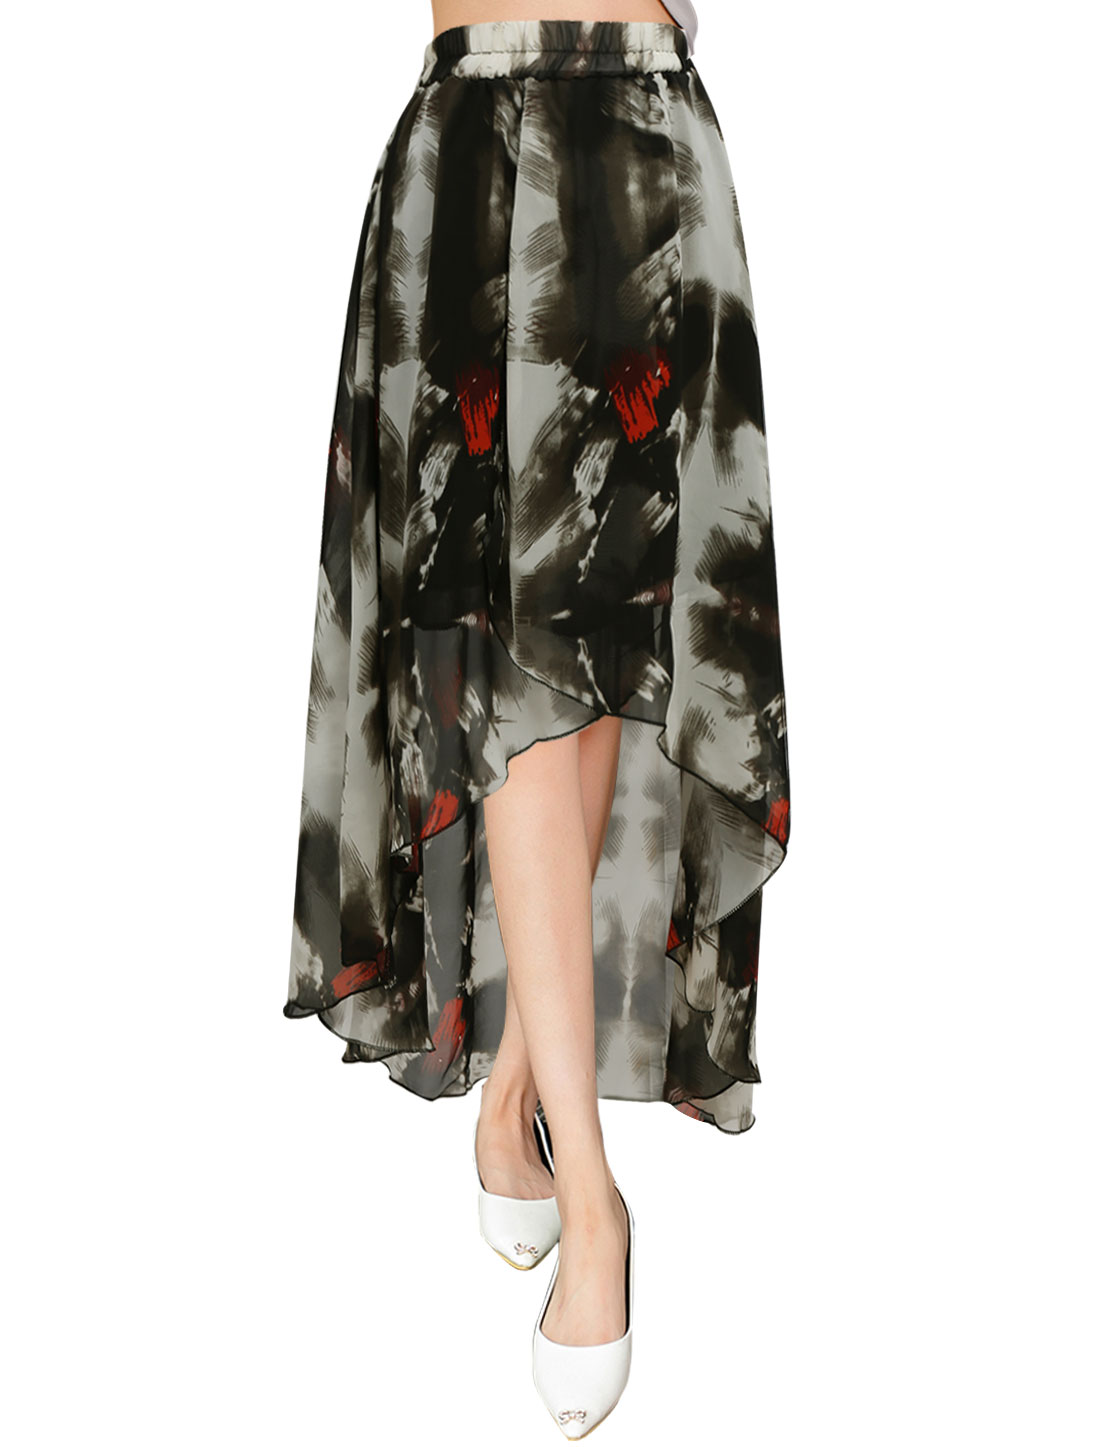 Ladies High Waist Asymmetrical Trim Novelty Prints Dress Black XS